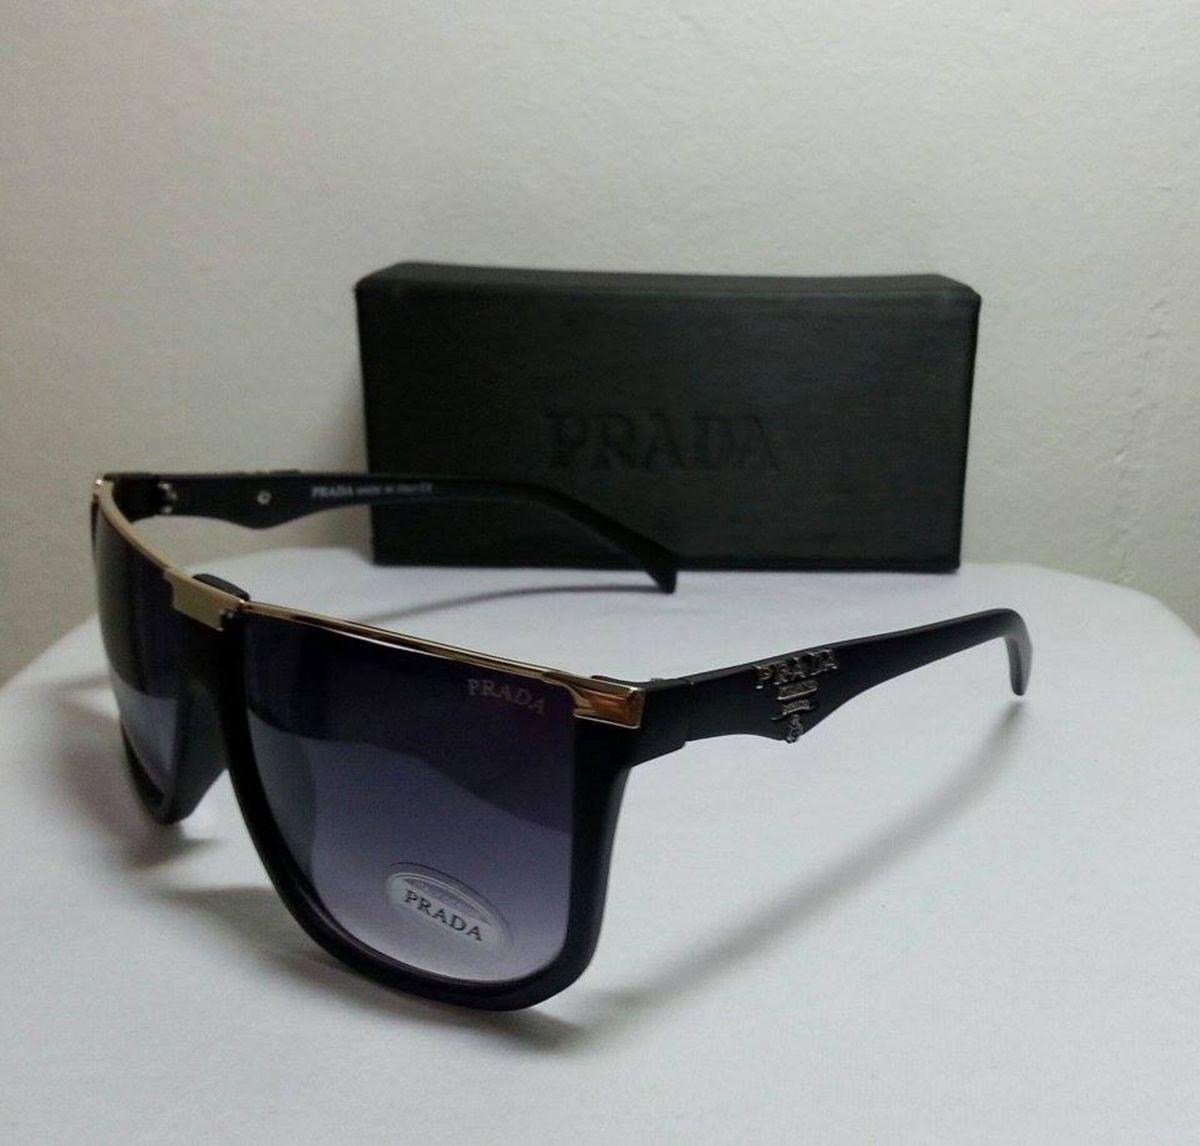 b0c9ec7e3 Óculos de Sol Prada Milano Luxuria | Óculos Feminino Prada Nunca ...